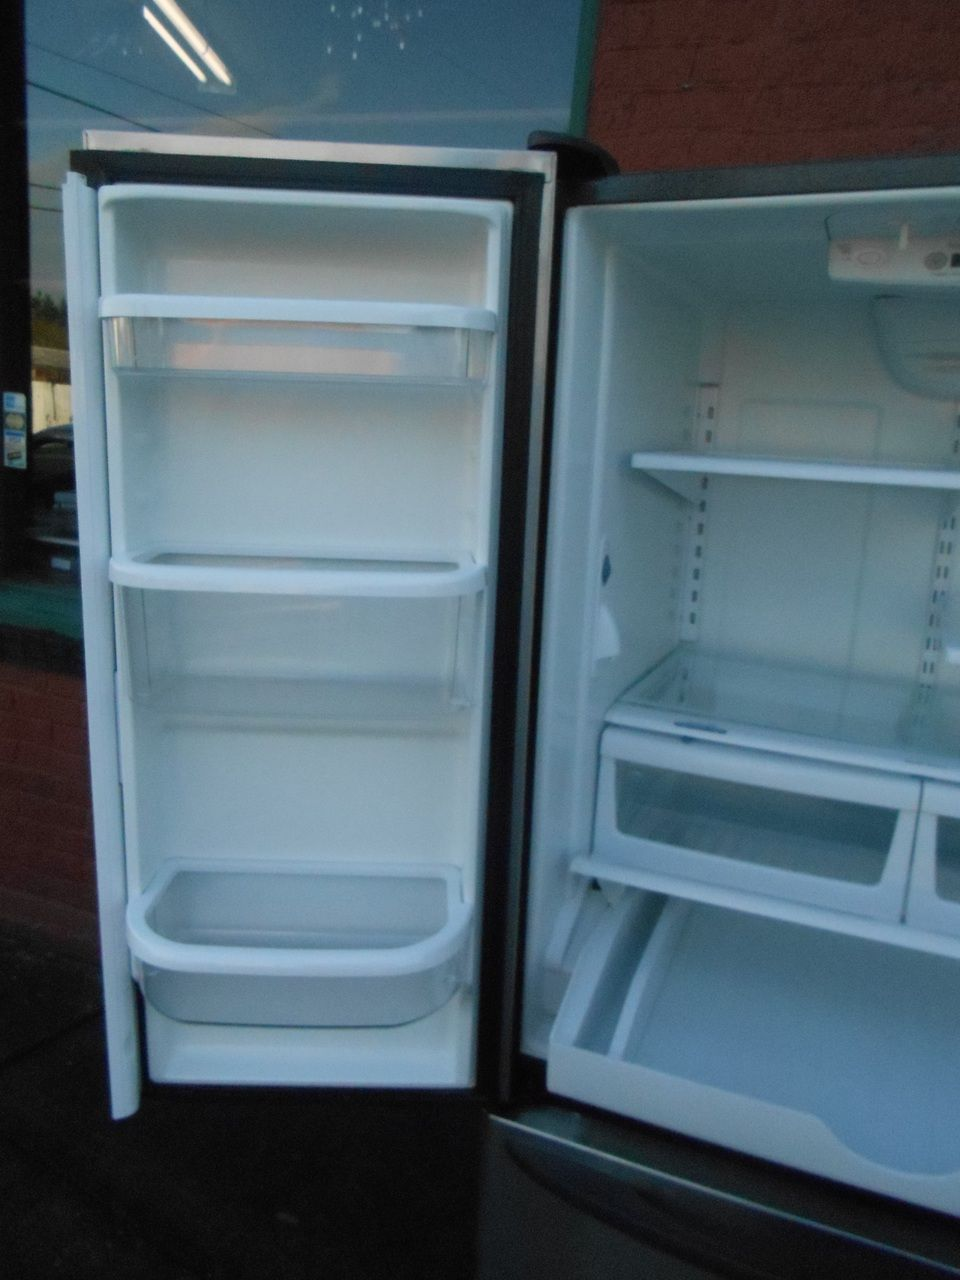 kenmore fridge inside. appliance city - kenmore elite french door refrigerator bottom freezer ice maker inside water dispenser adjustable kenmore fridge inside